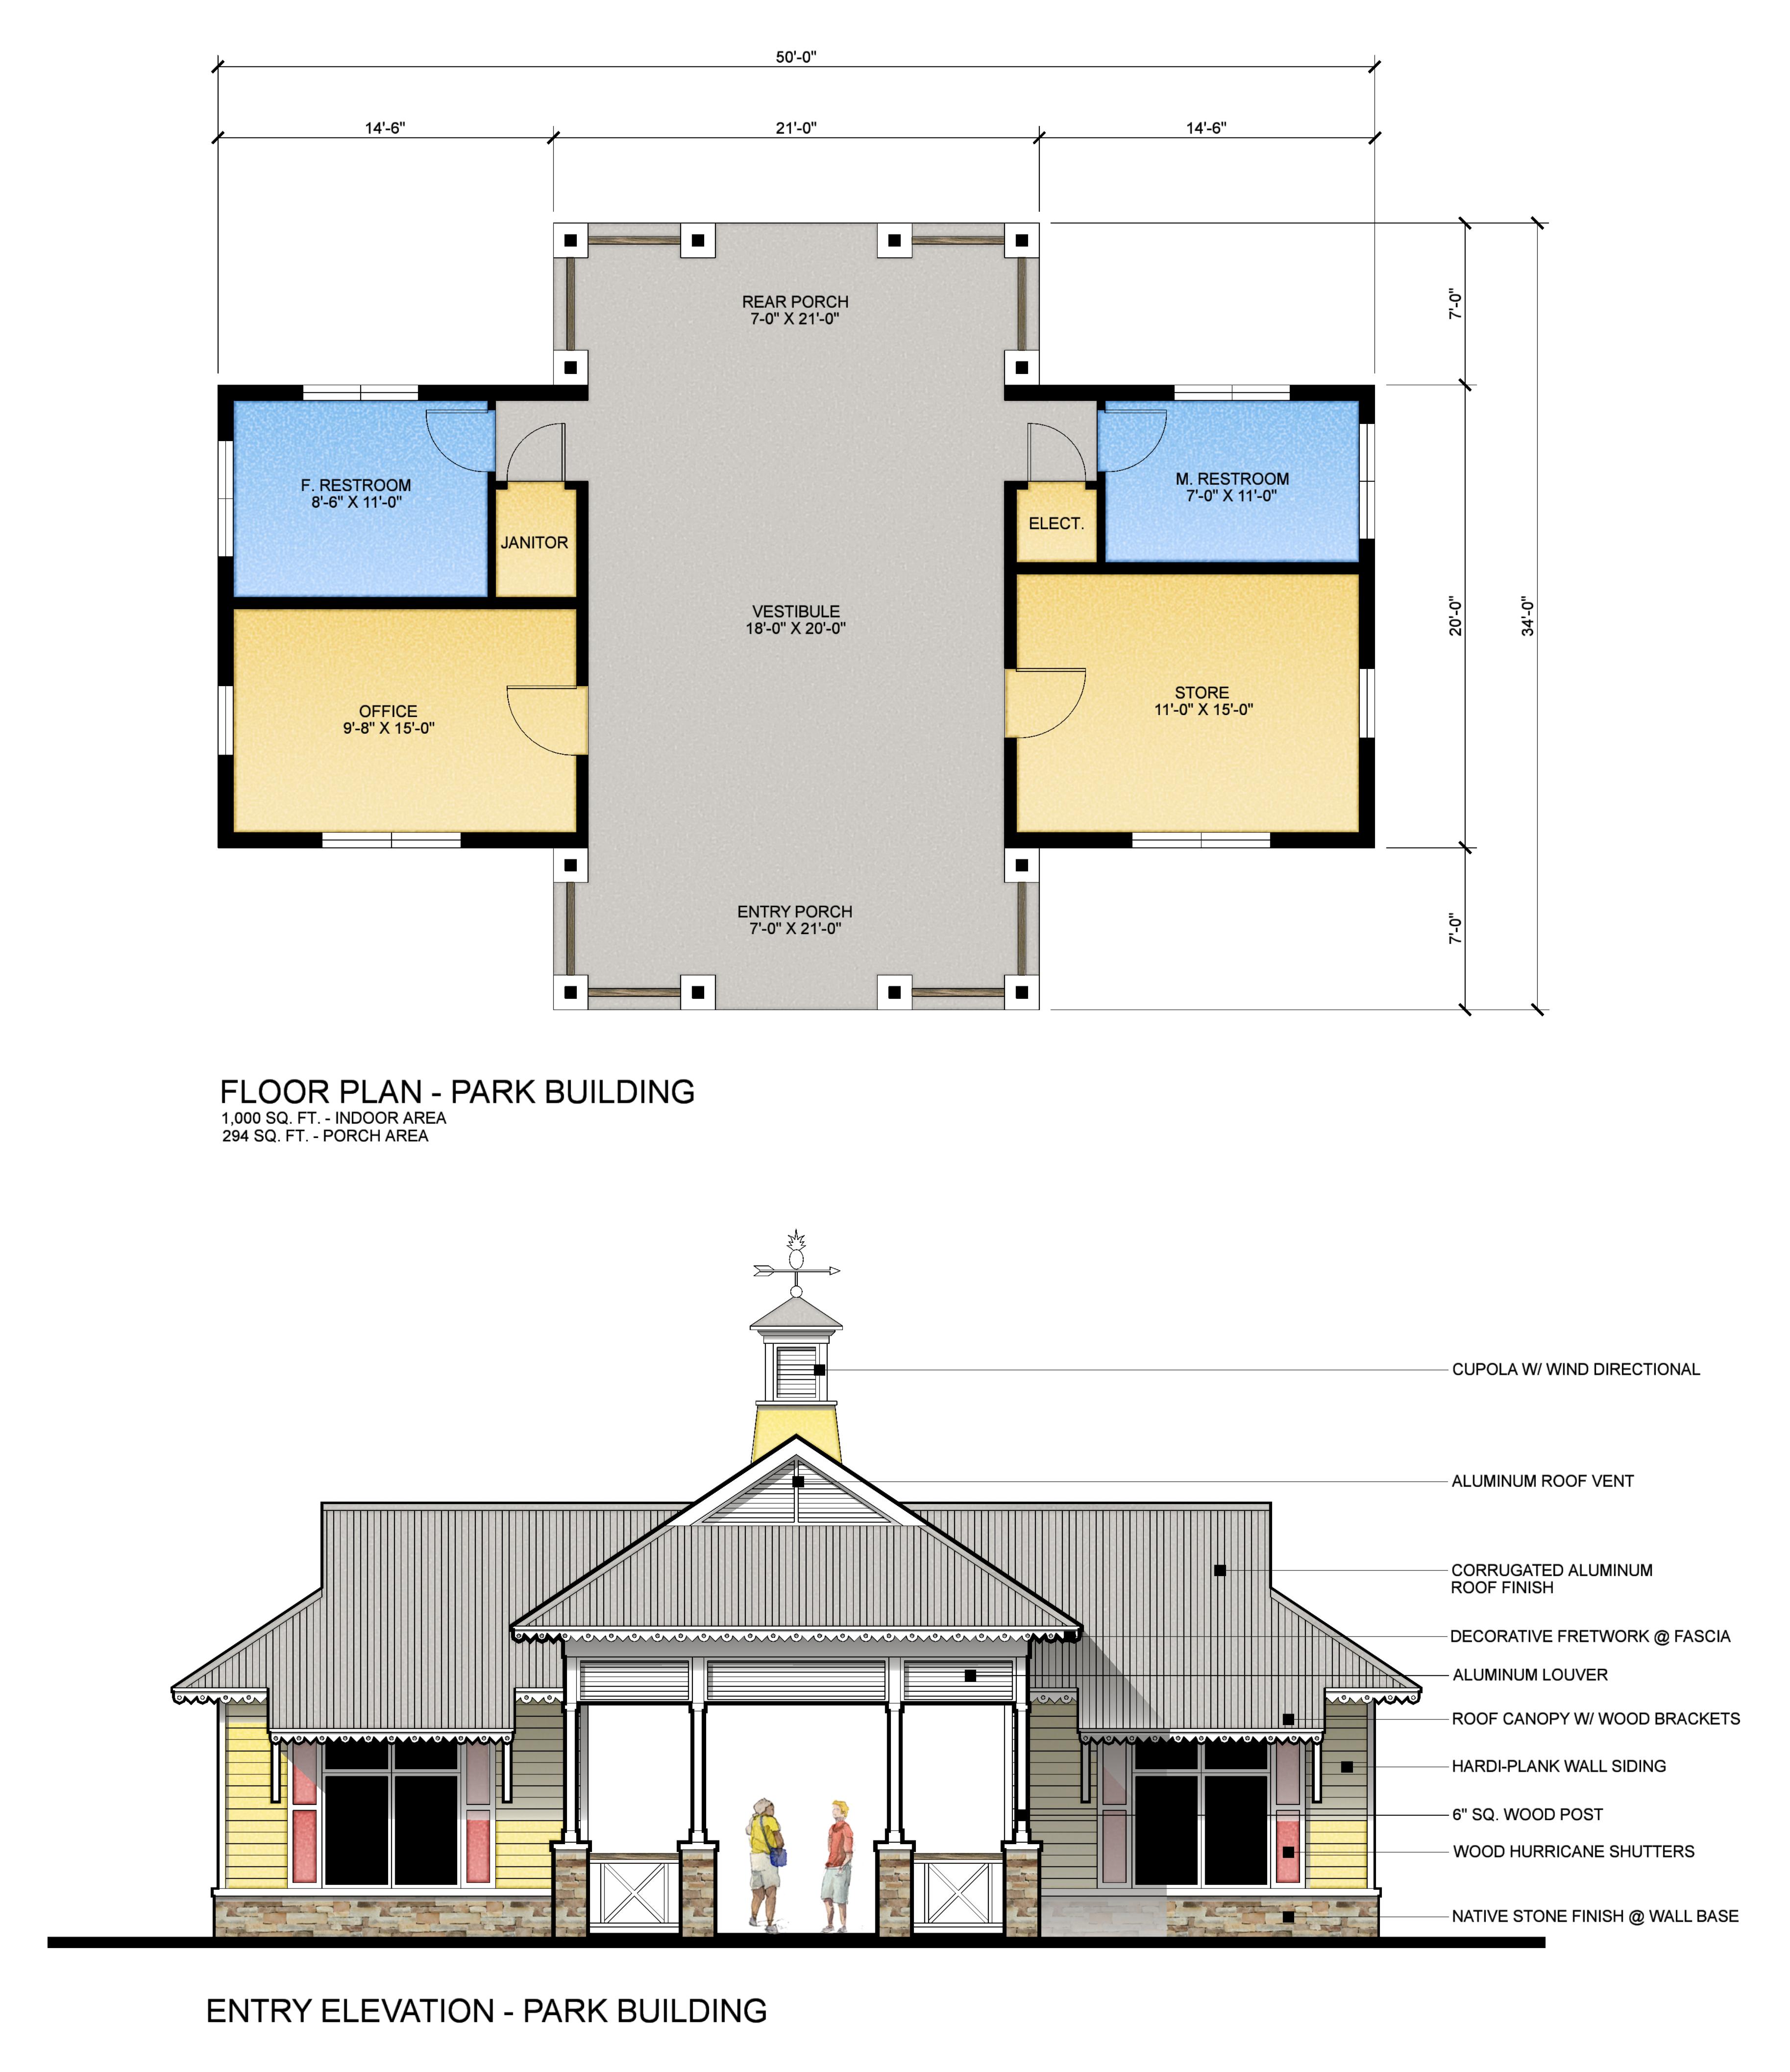 Park Building Plan & Elevation